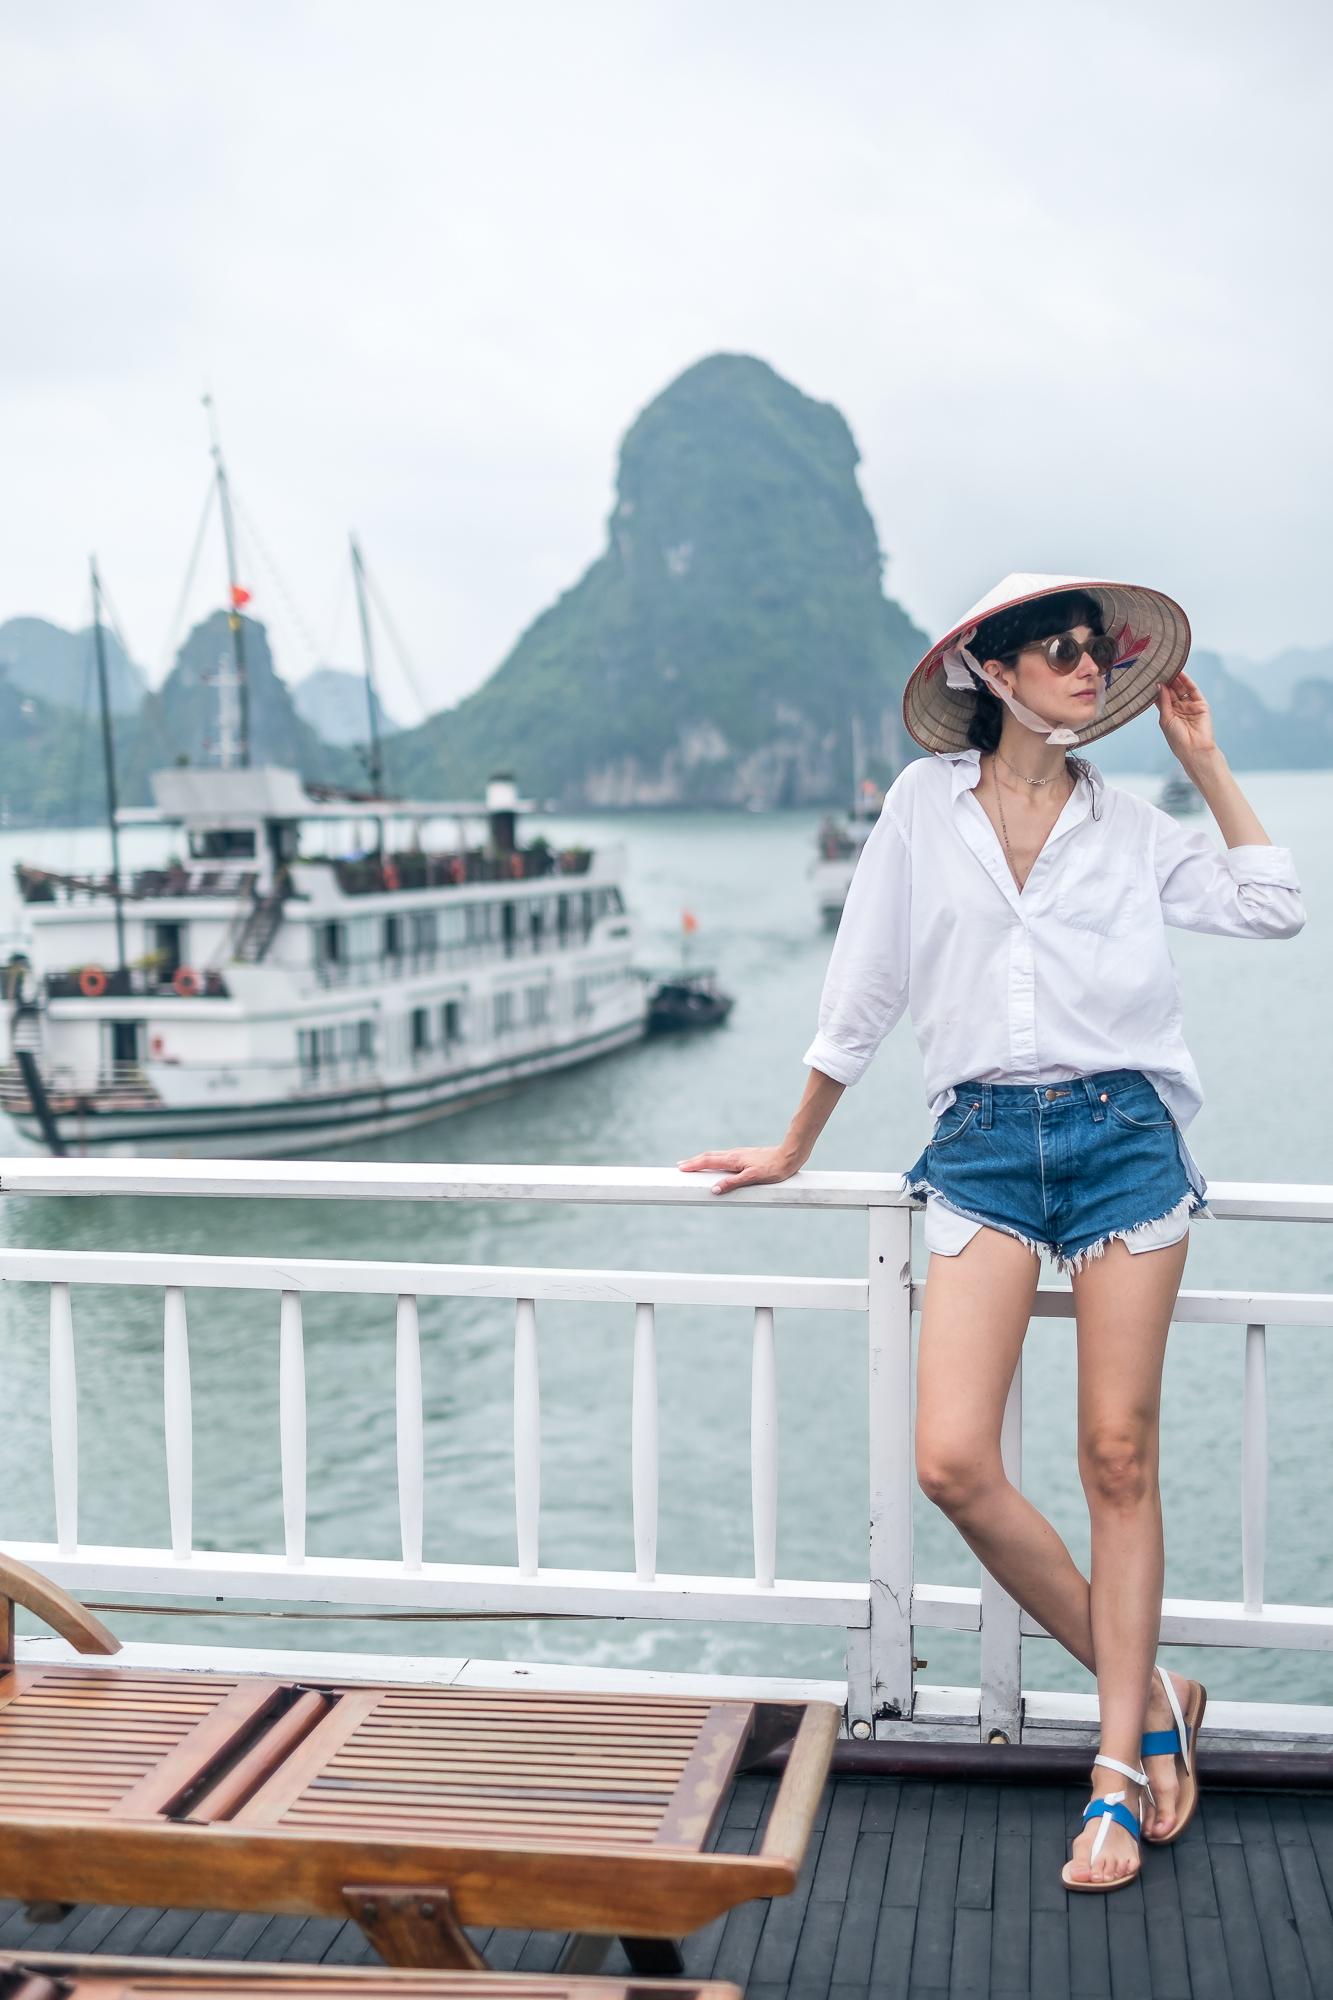 Vietnam_Honeymoon_TheOutsiderBlog_DSCF8560.JPG